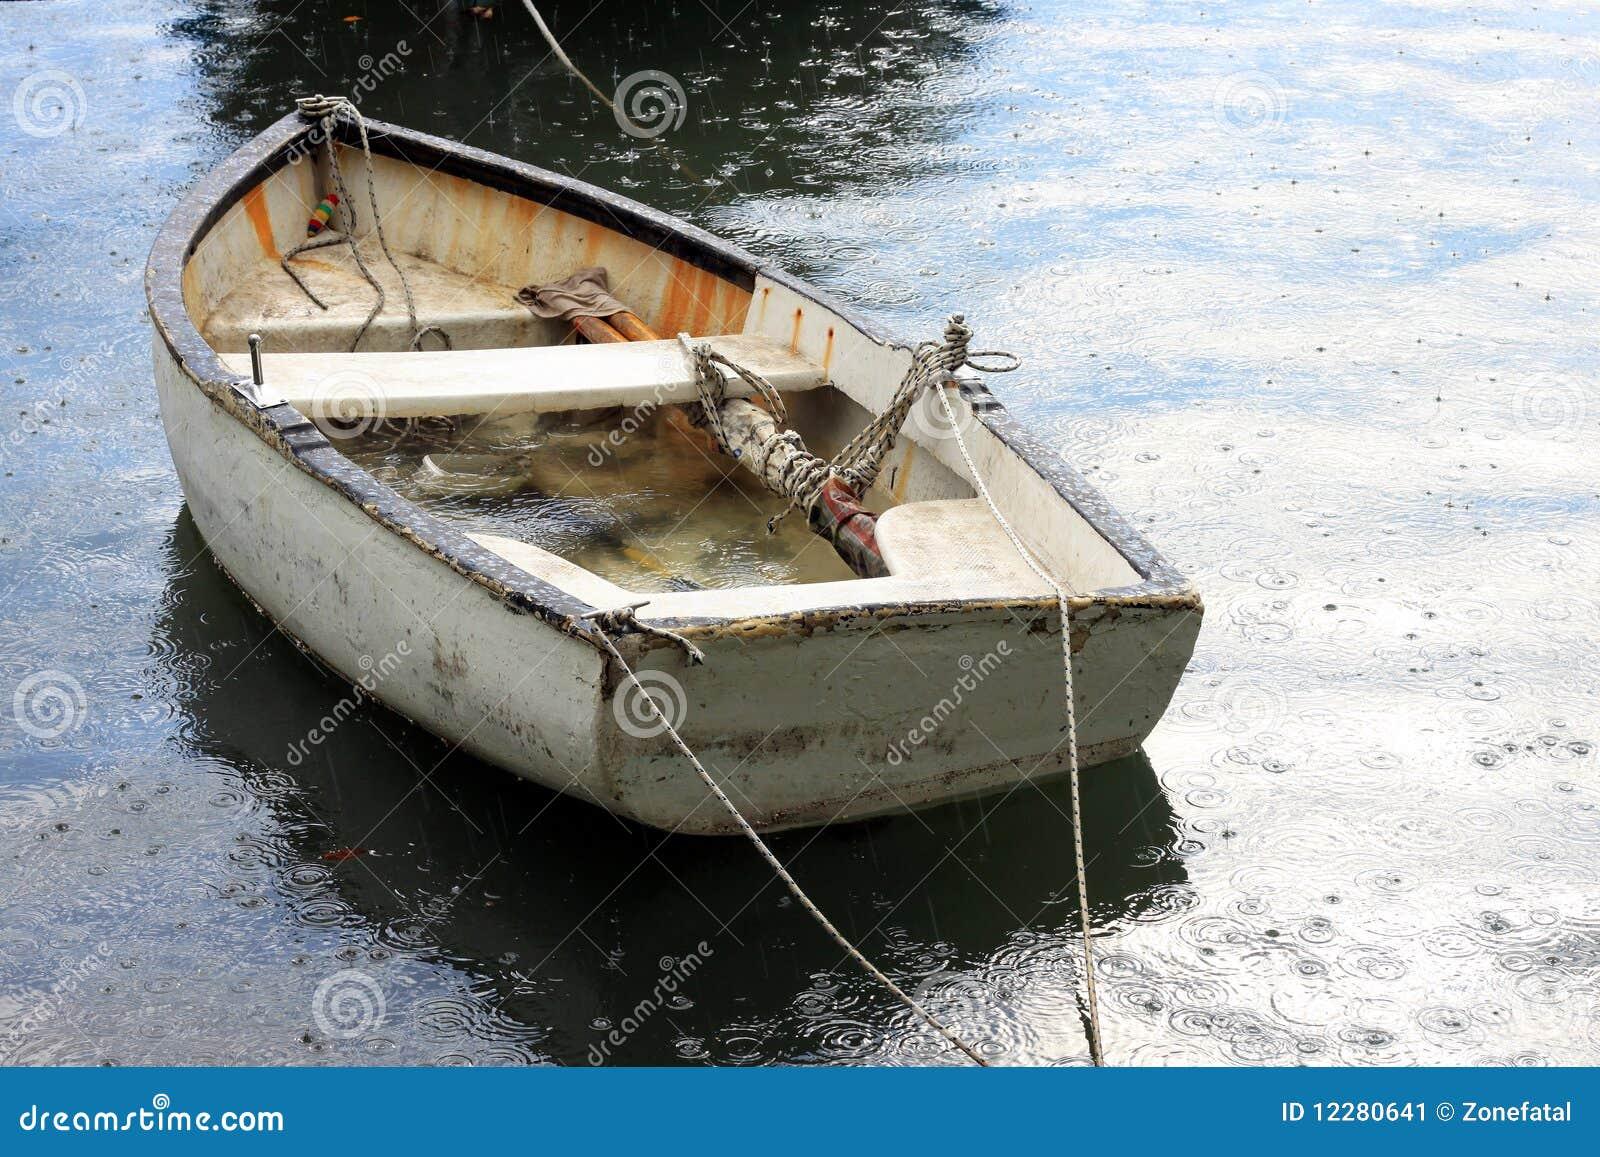 Boat Under The Rain Stock Image - Image: 12280641